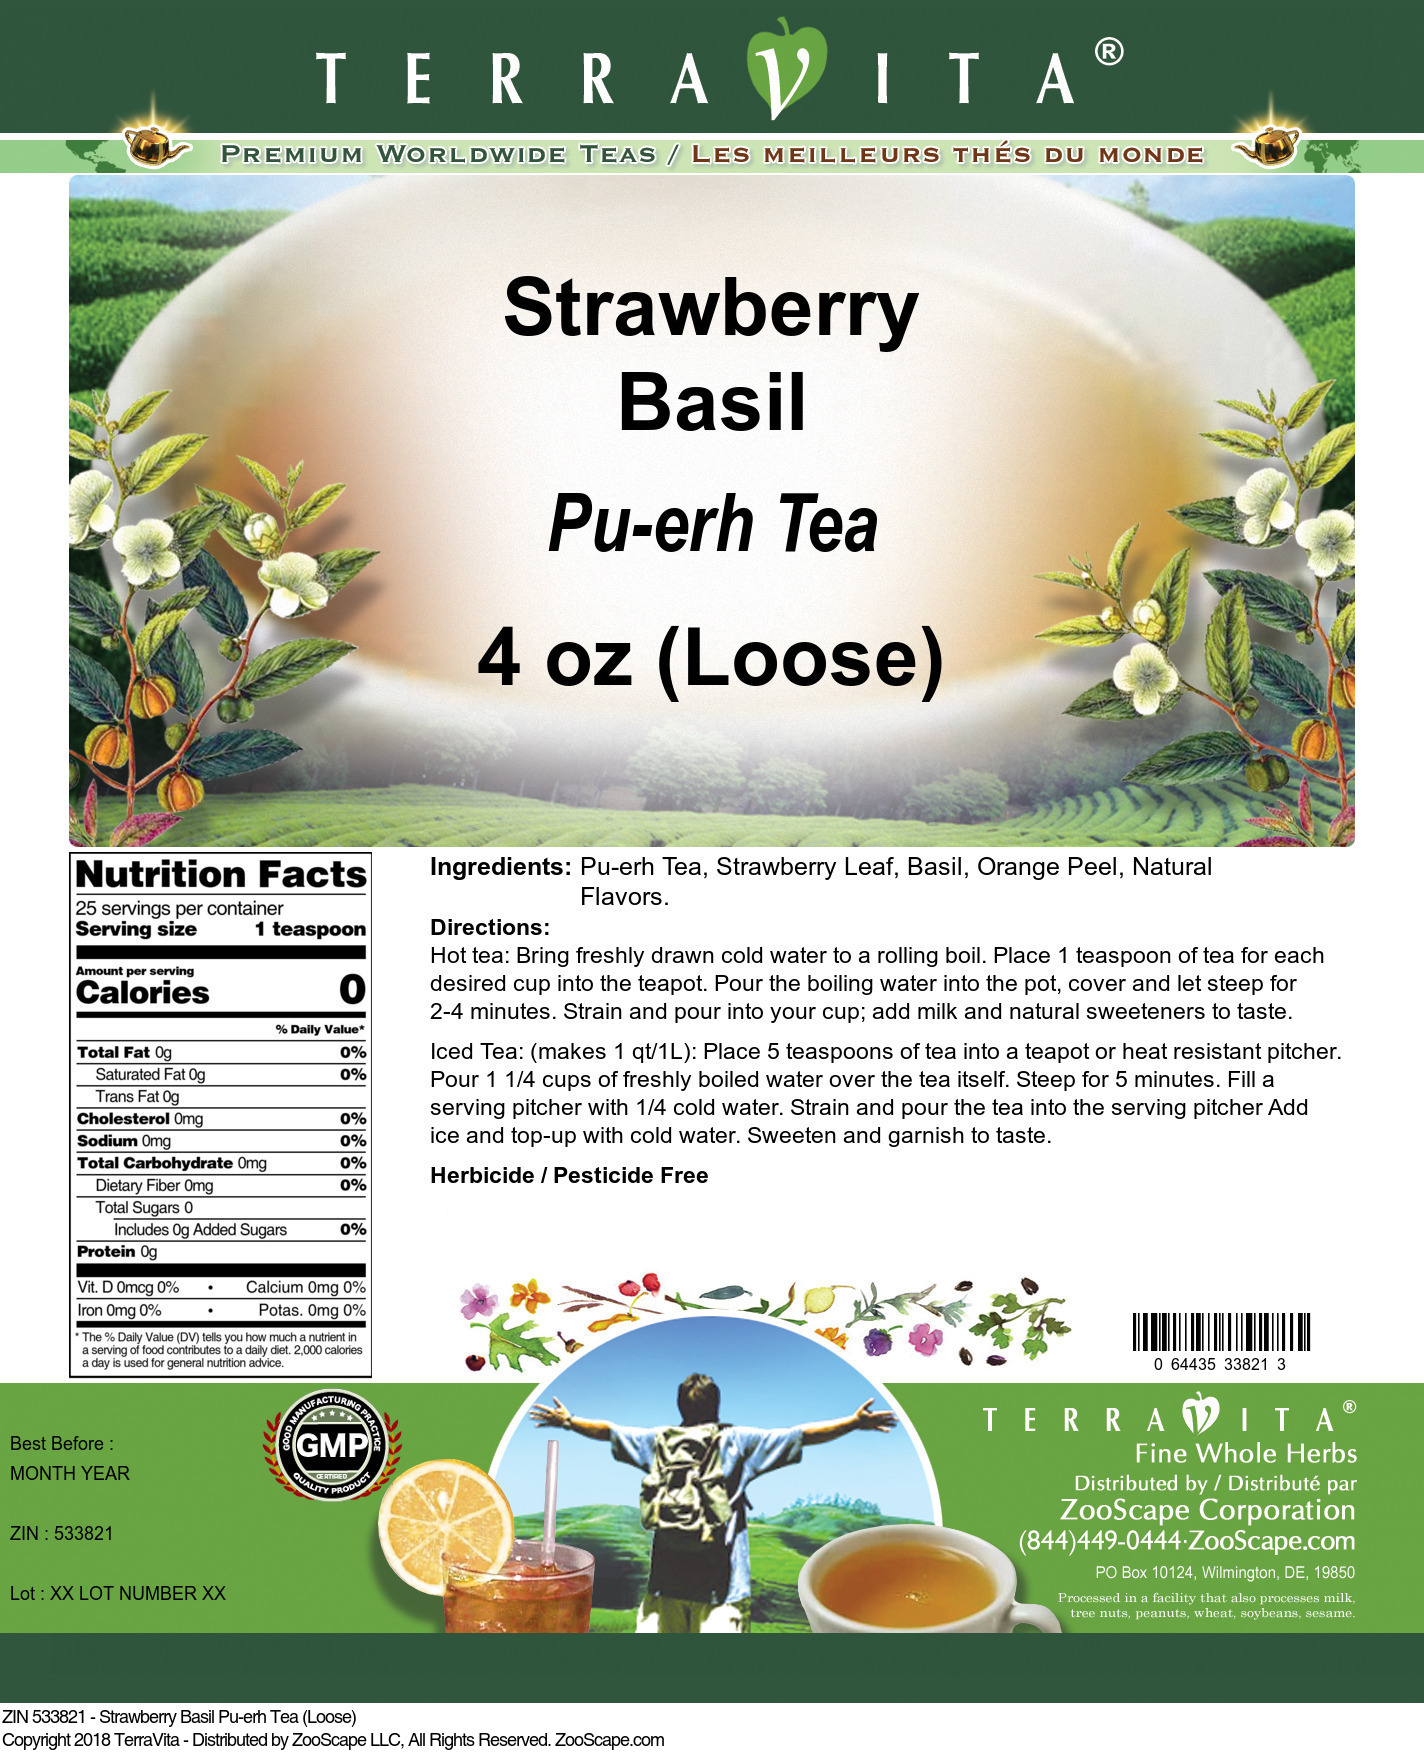 Strawberry Basil Pu-erh Tea (Loose)